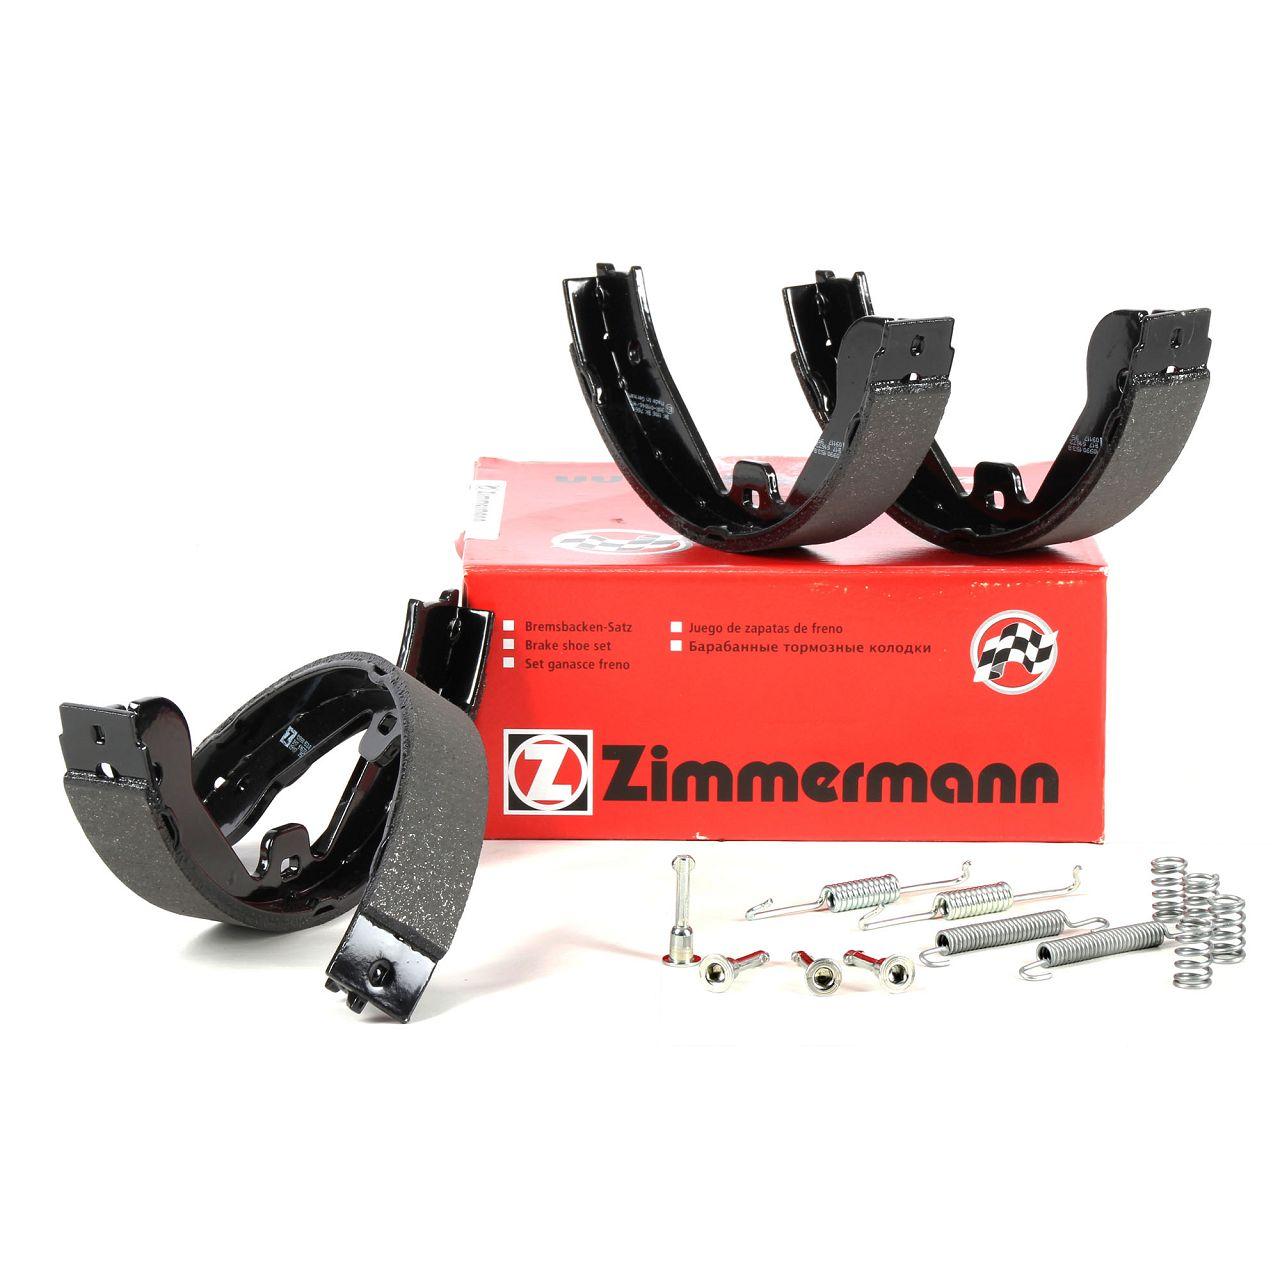 ZIMMERMANN Bremsbacken + Federn Satz AUDI Q7 MERCEDES X164 W164 VW Touareg